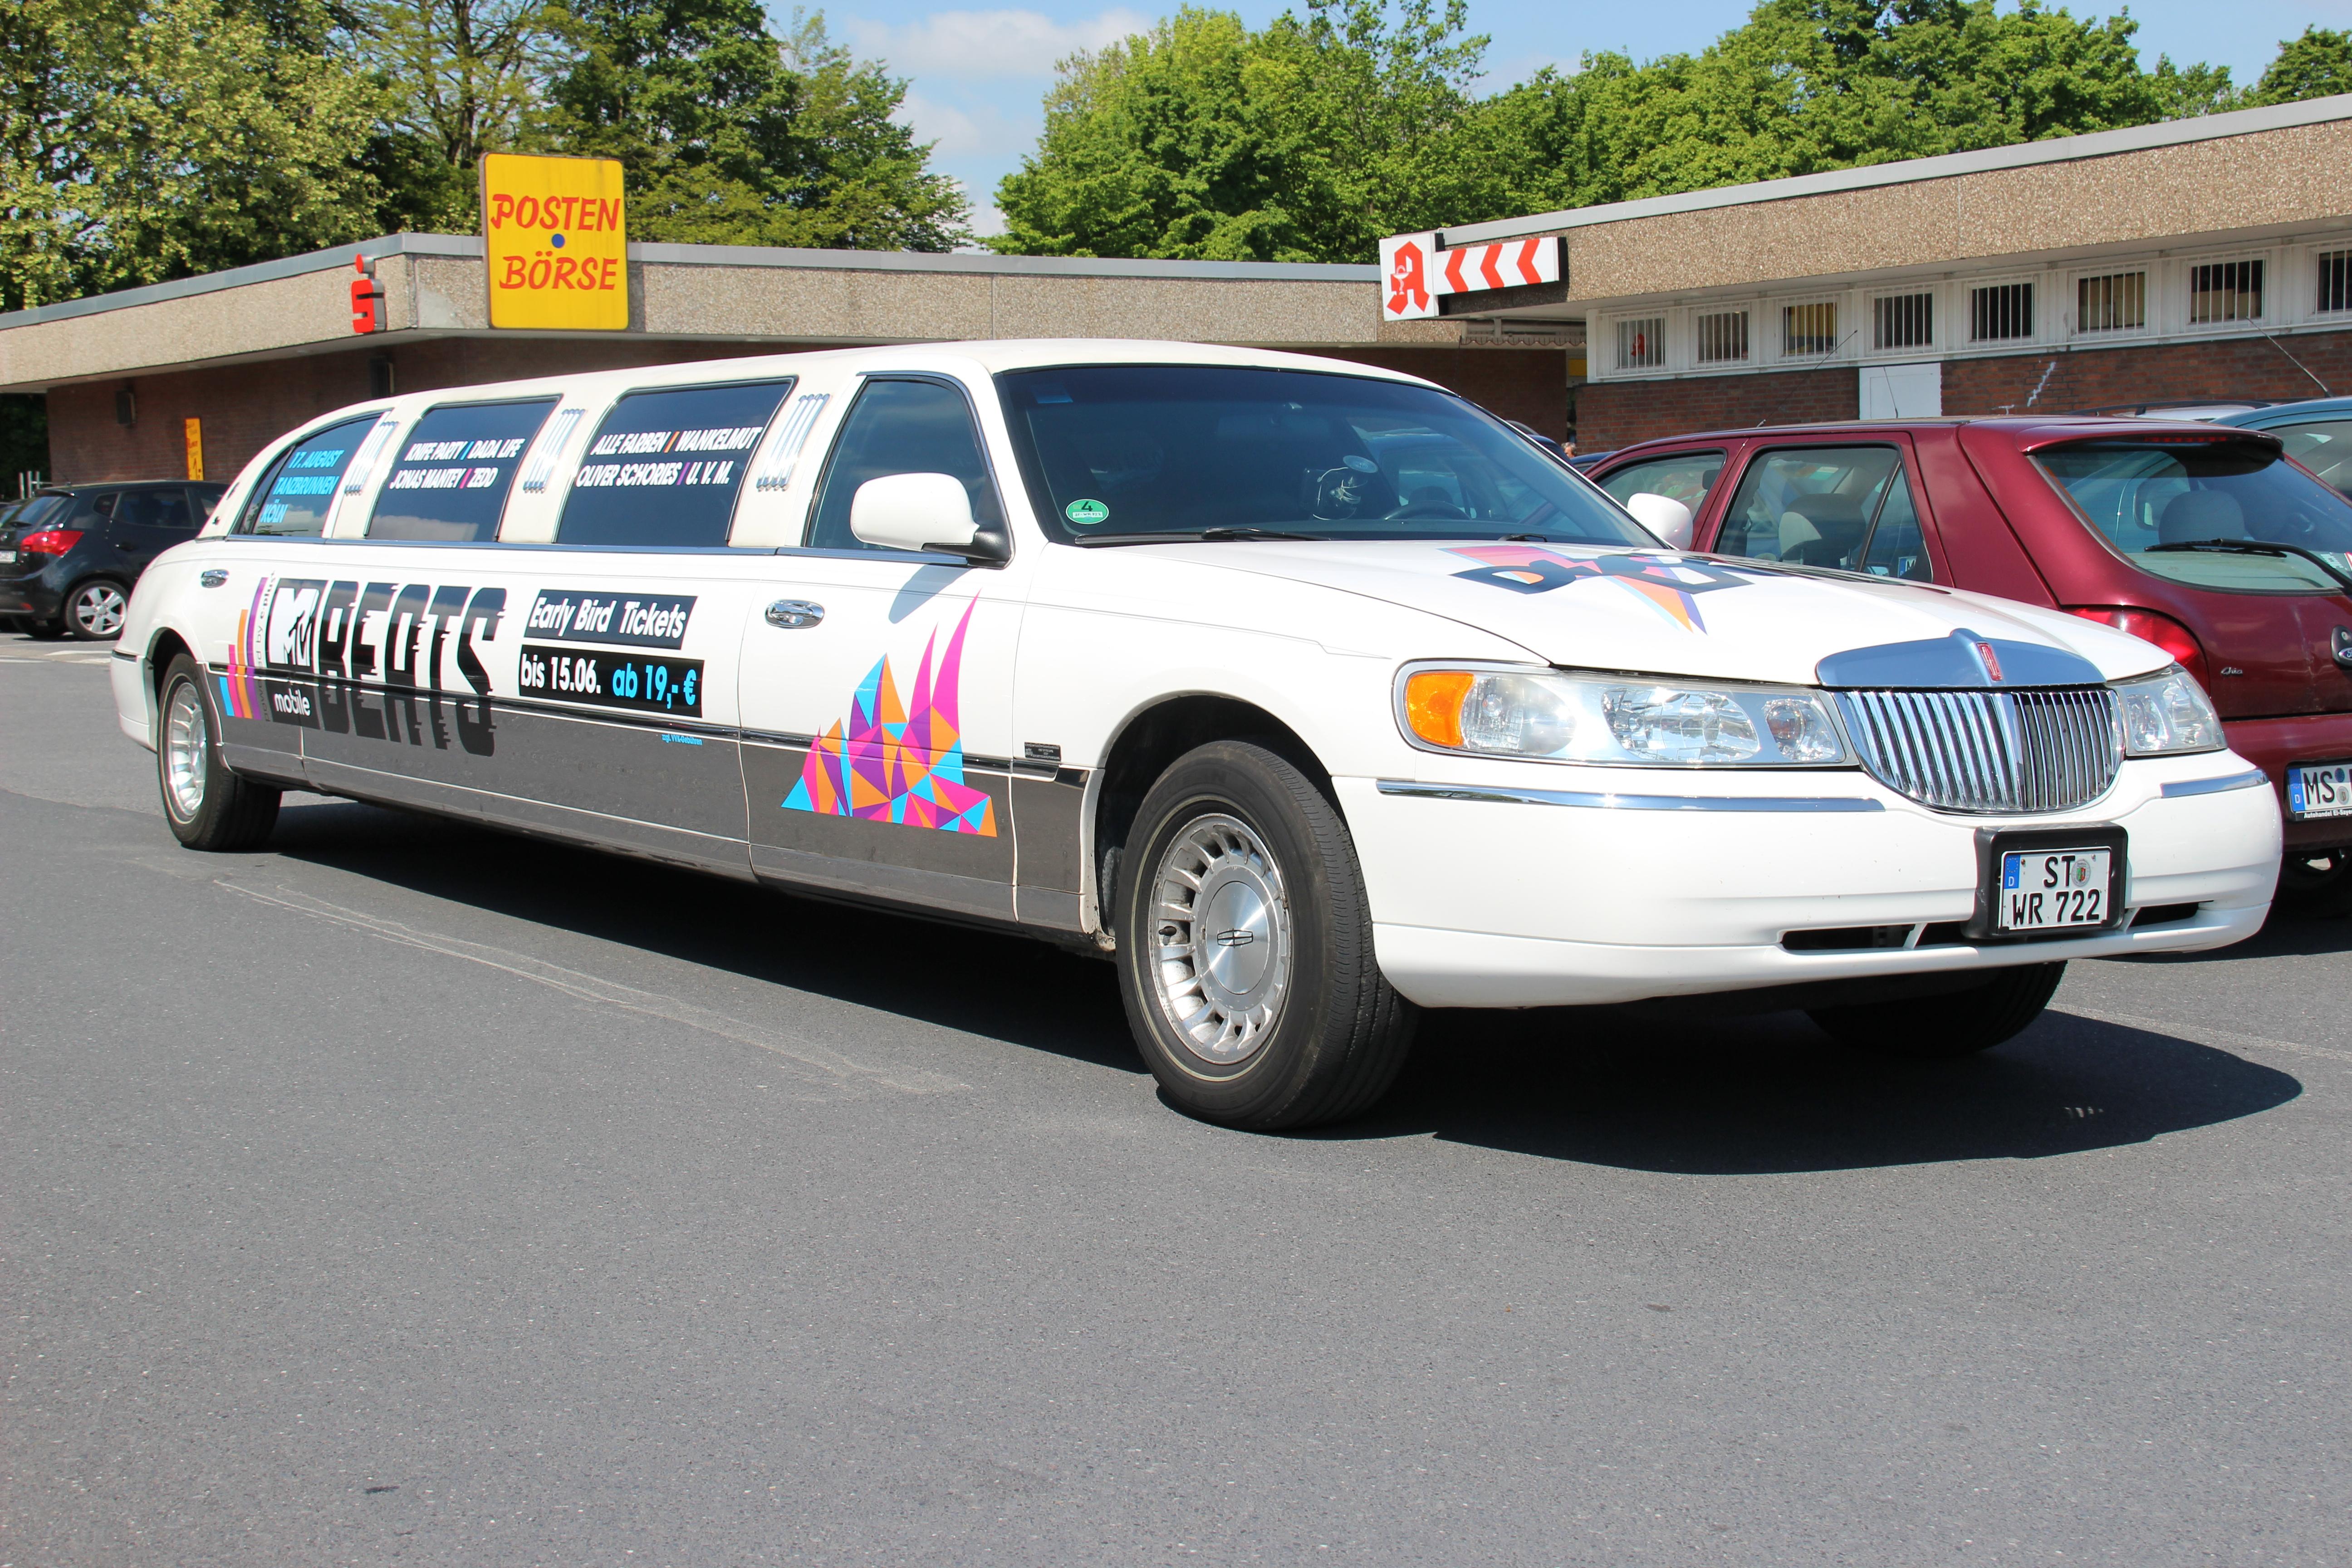 lincoln limousine mieten in nordhorn ril limoservice. Black Bedroom Furniture Sets. Home Design Ideas